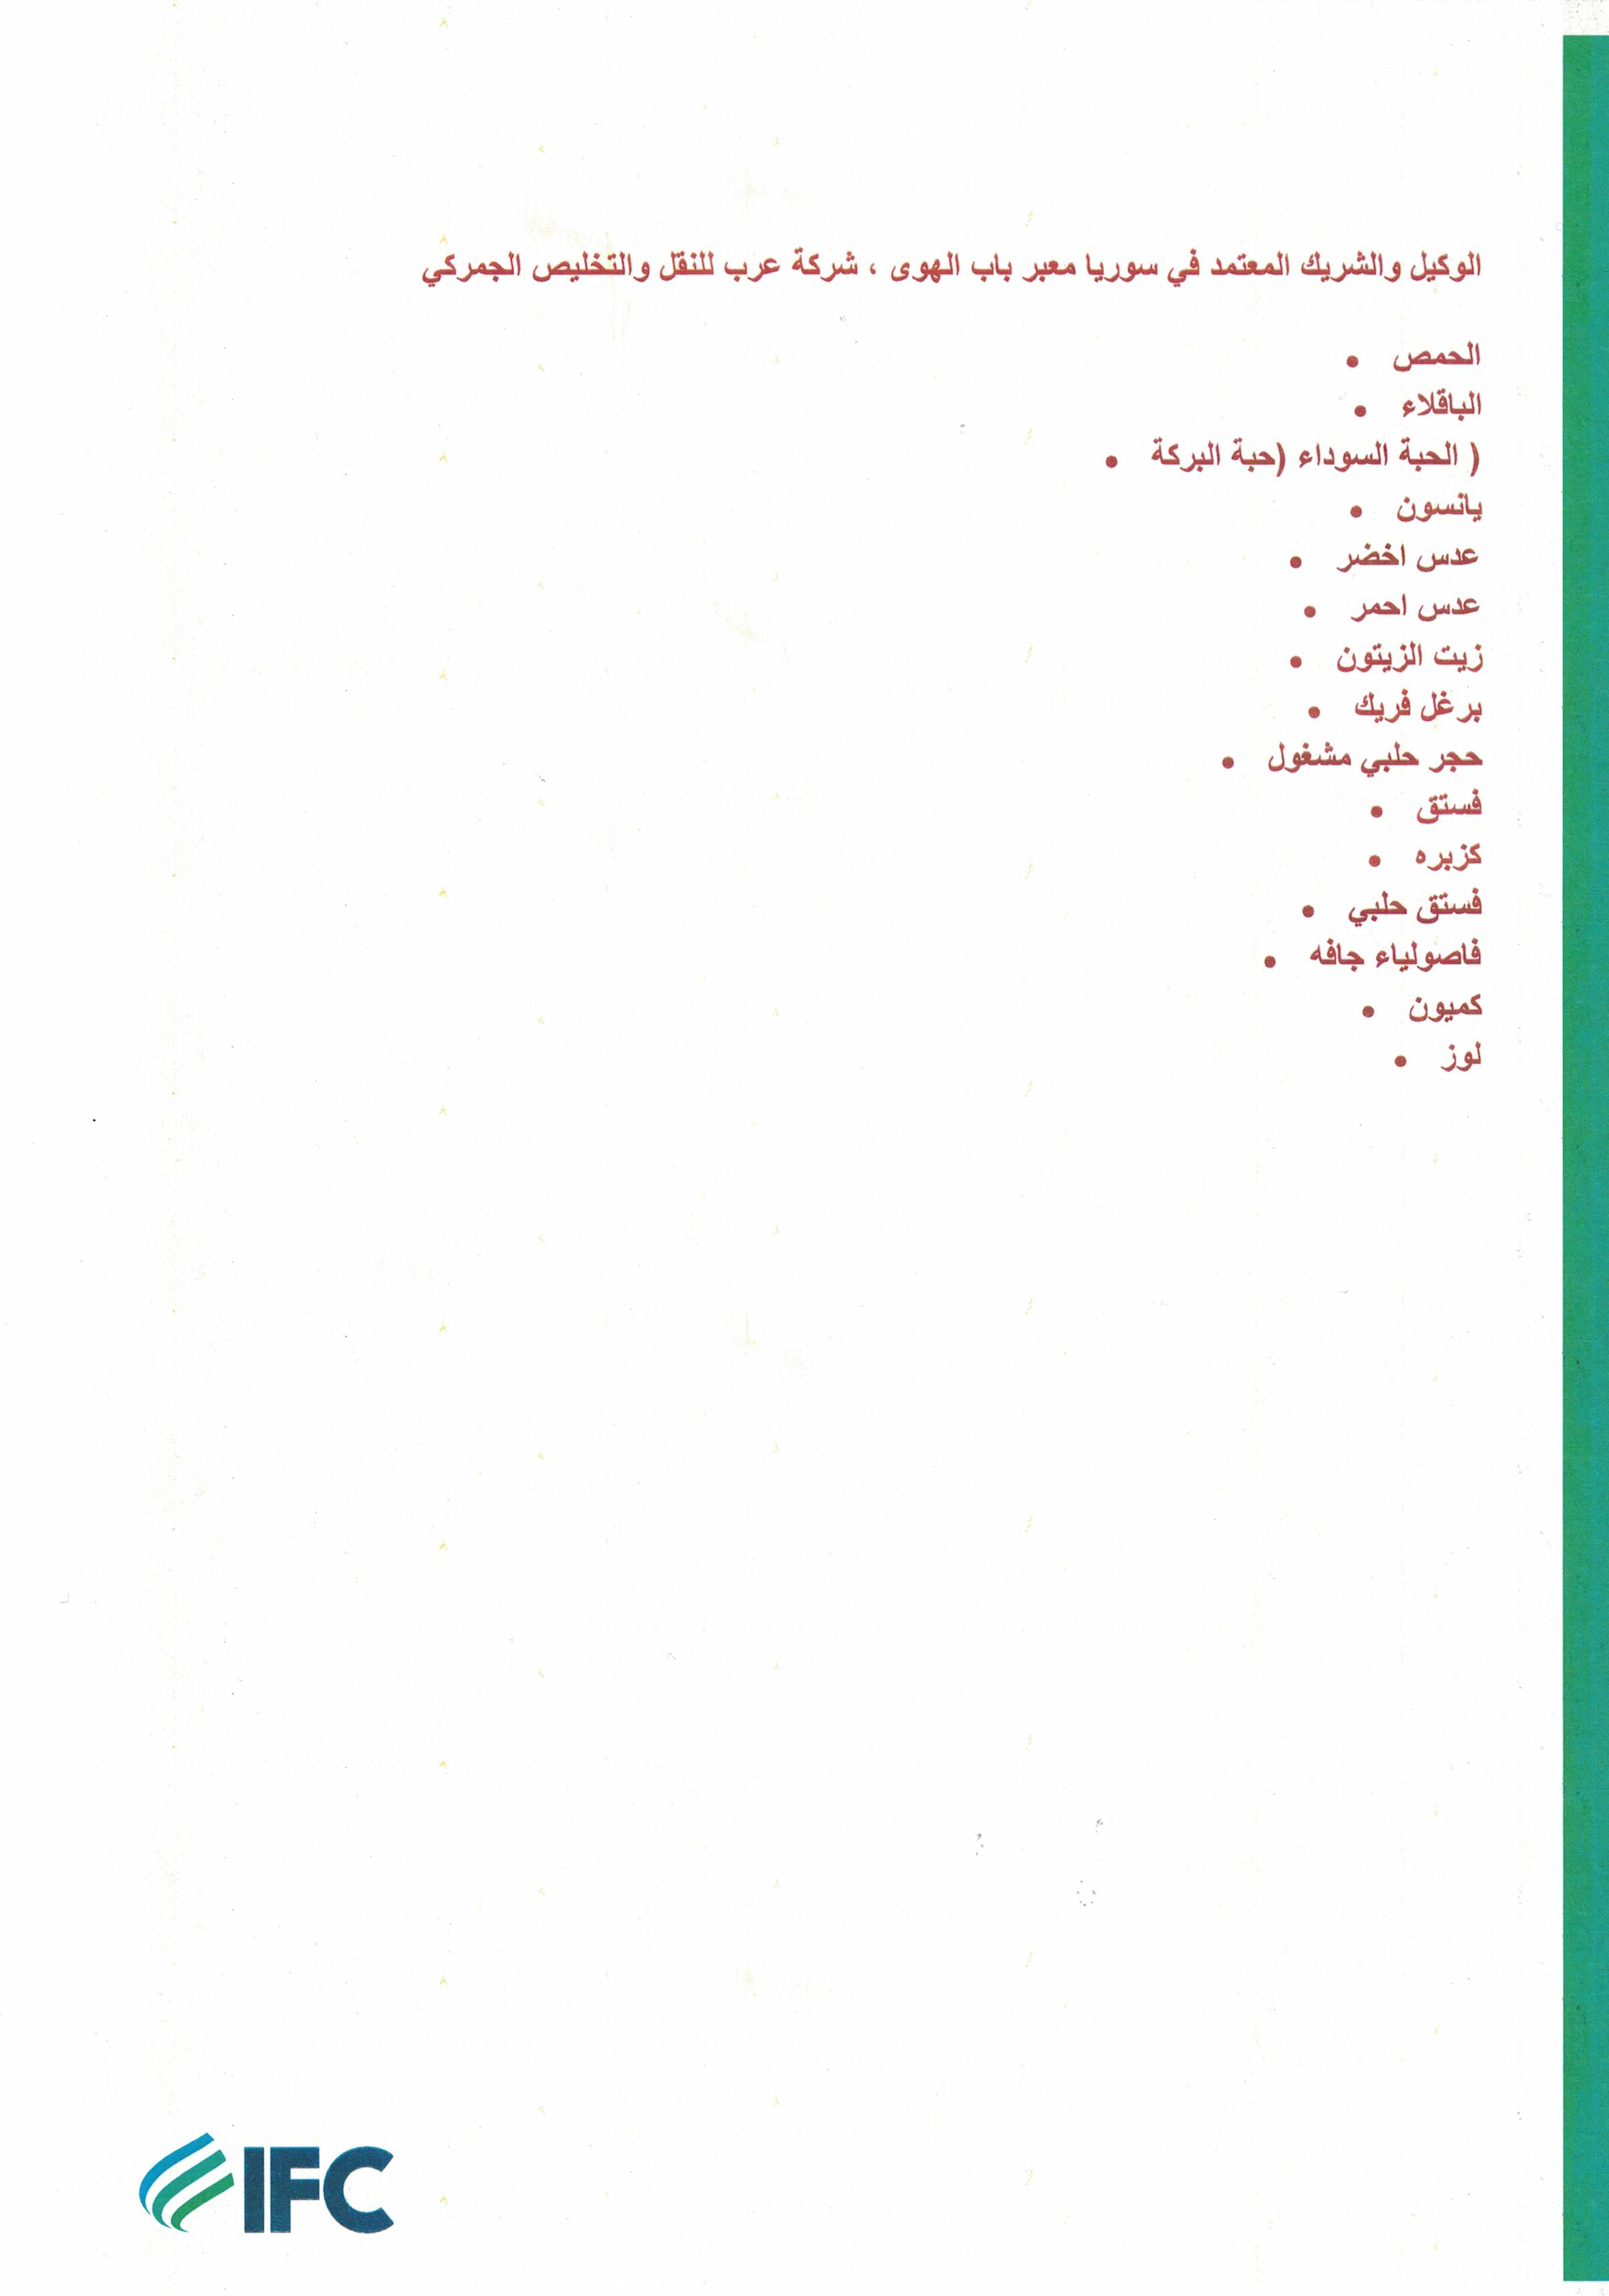 IFC ARABIC (2)